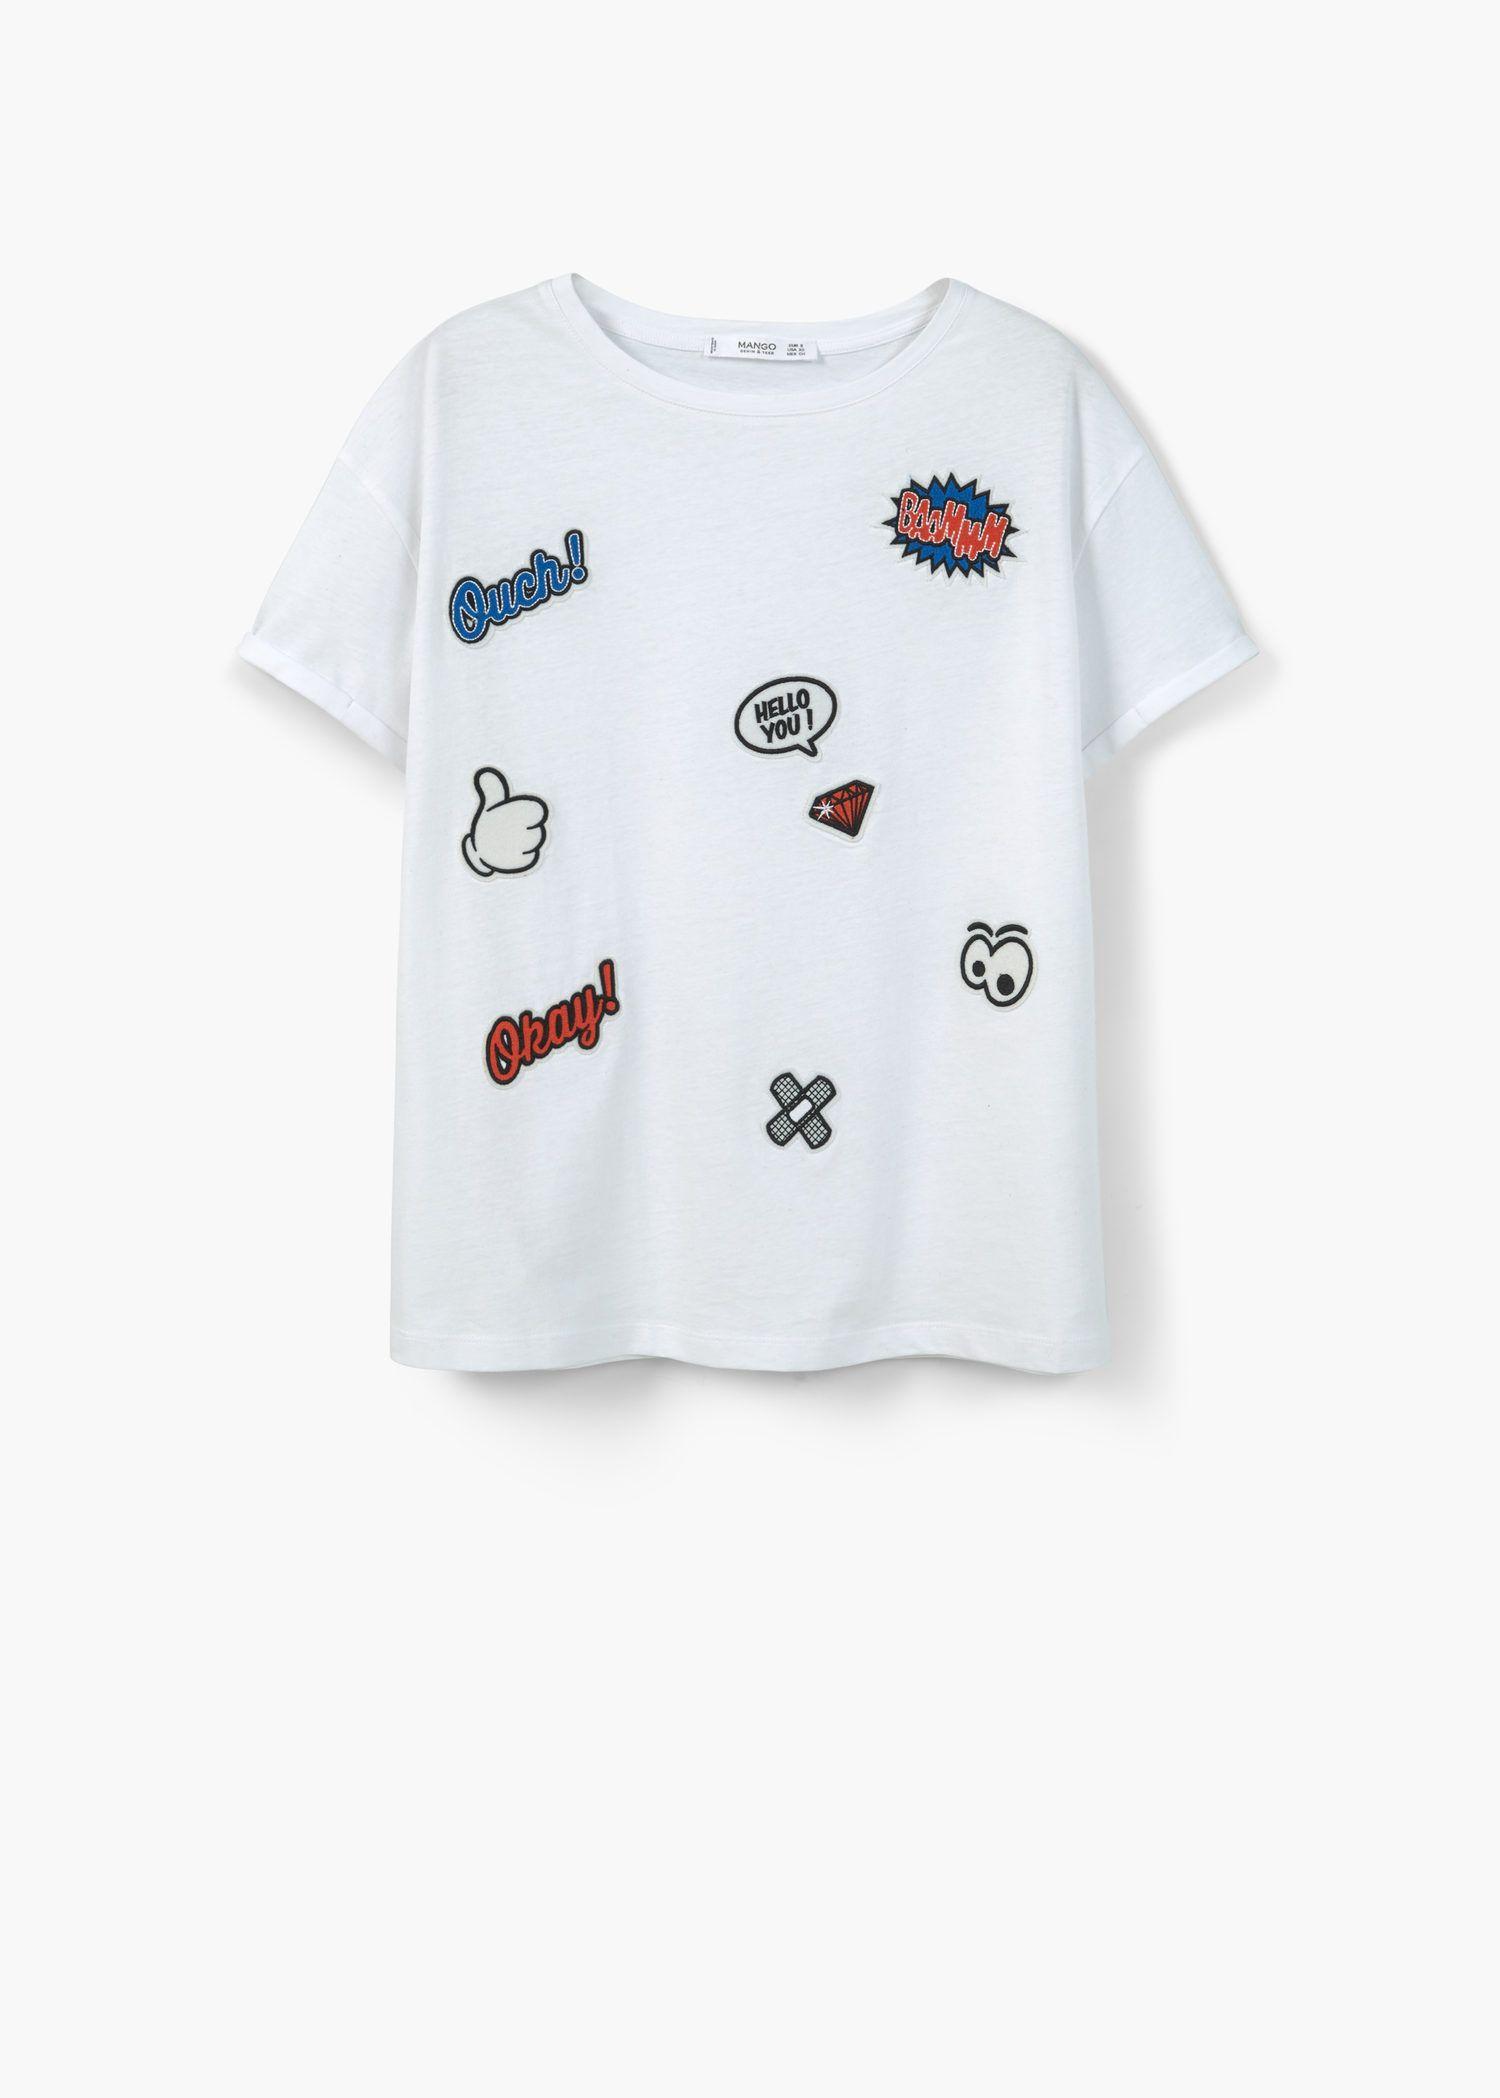 02439c6b3 Decorative patches t-shirt - Women | PATCH I T PIN I T | T shirts ...